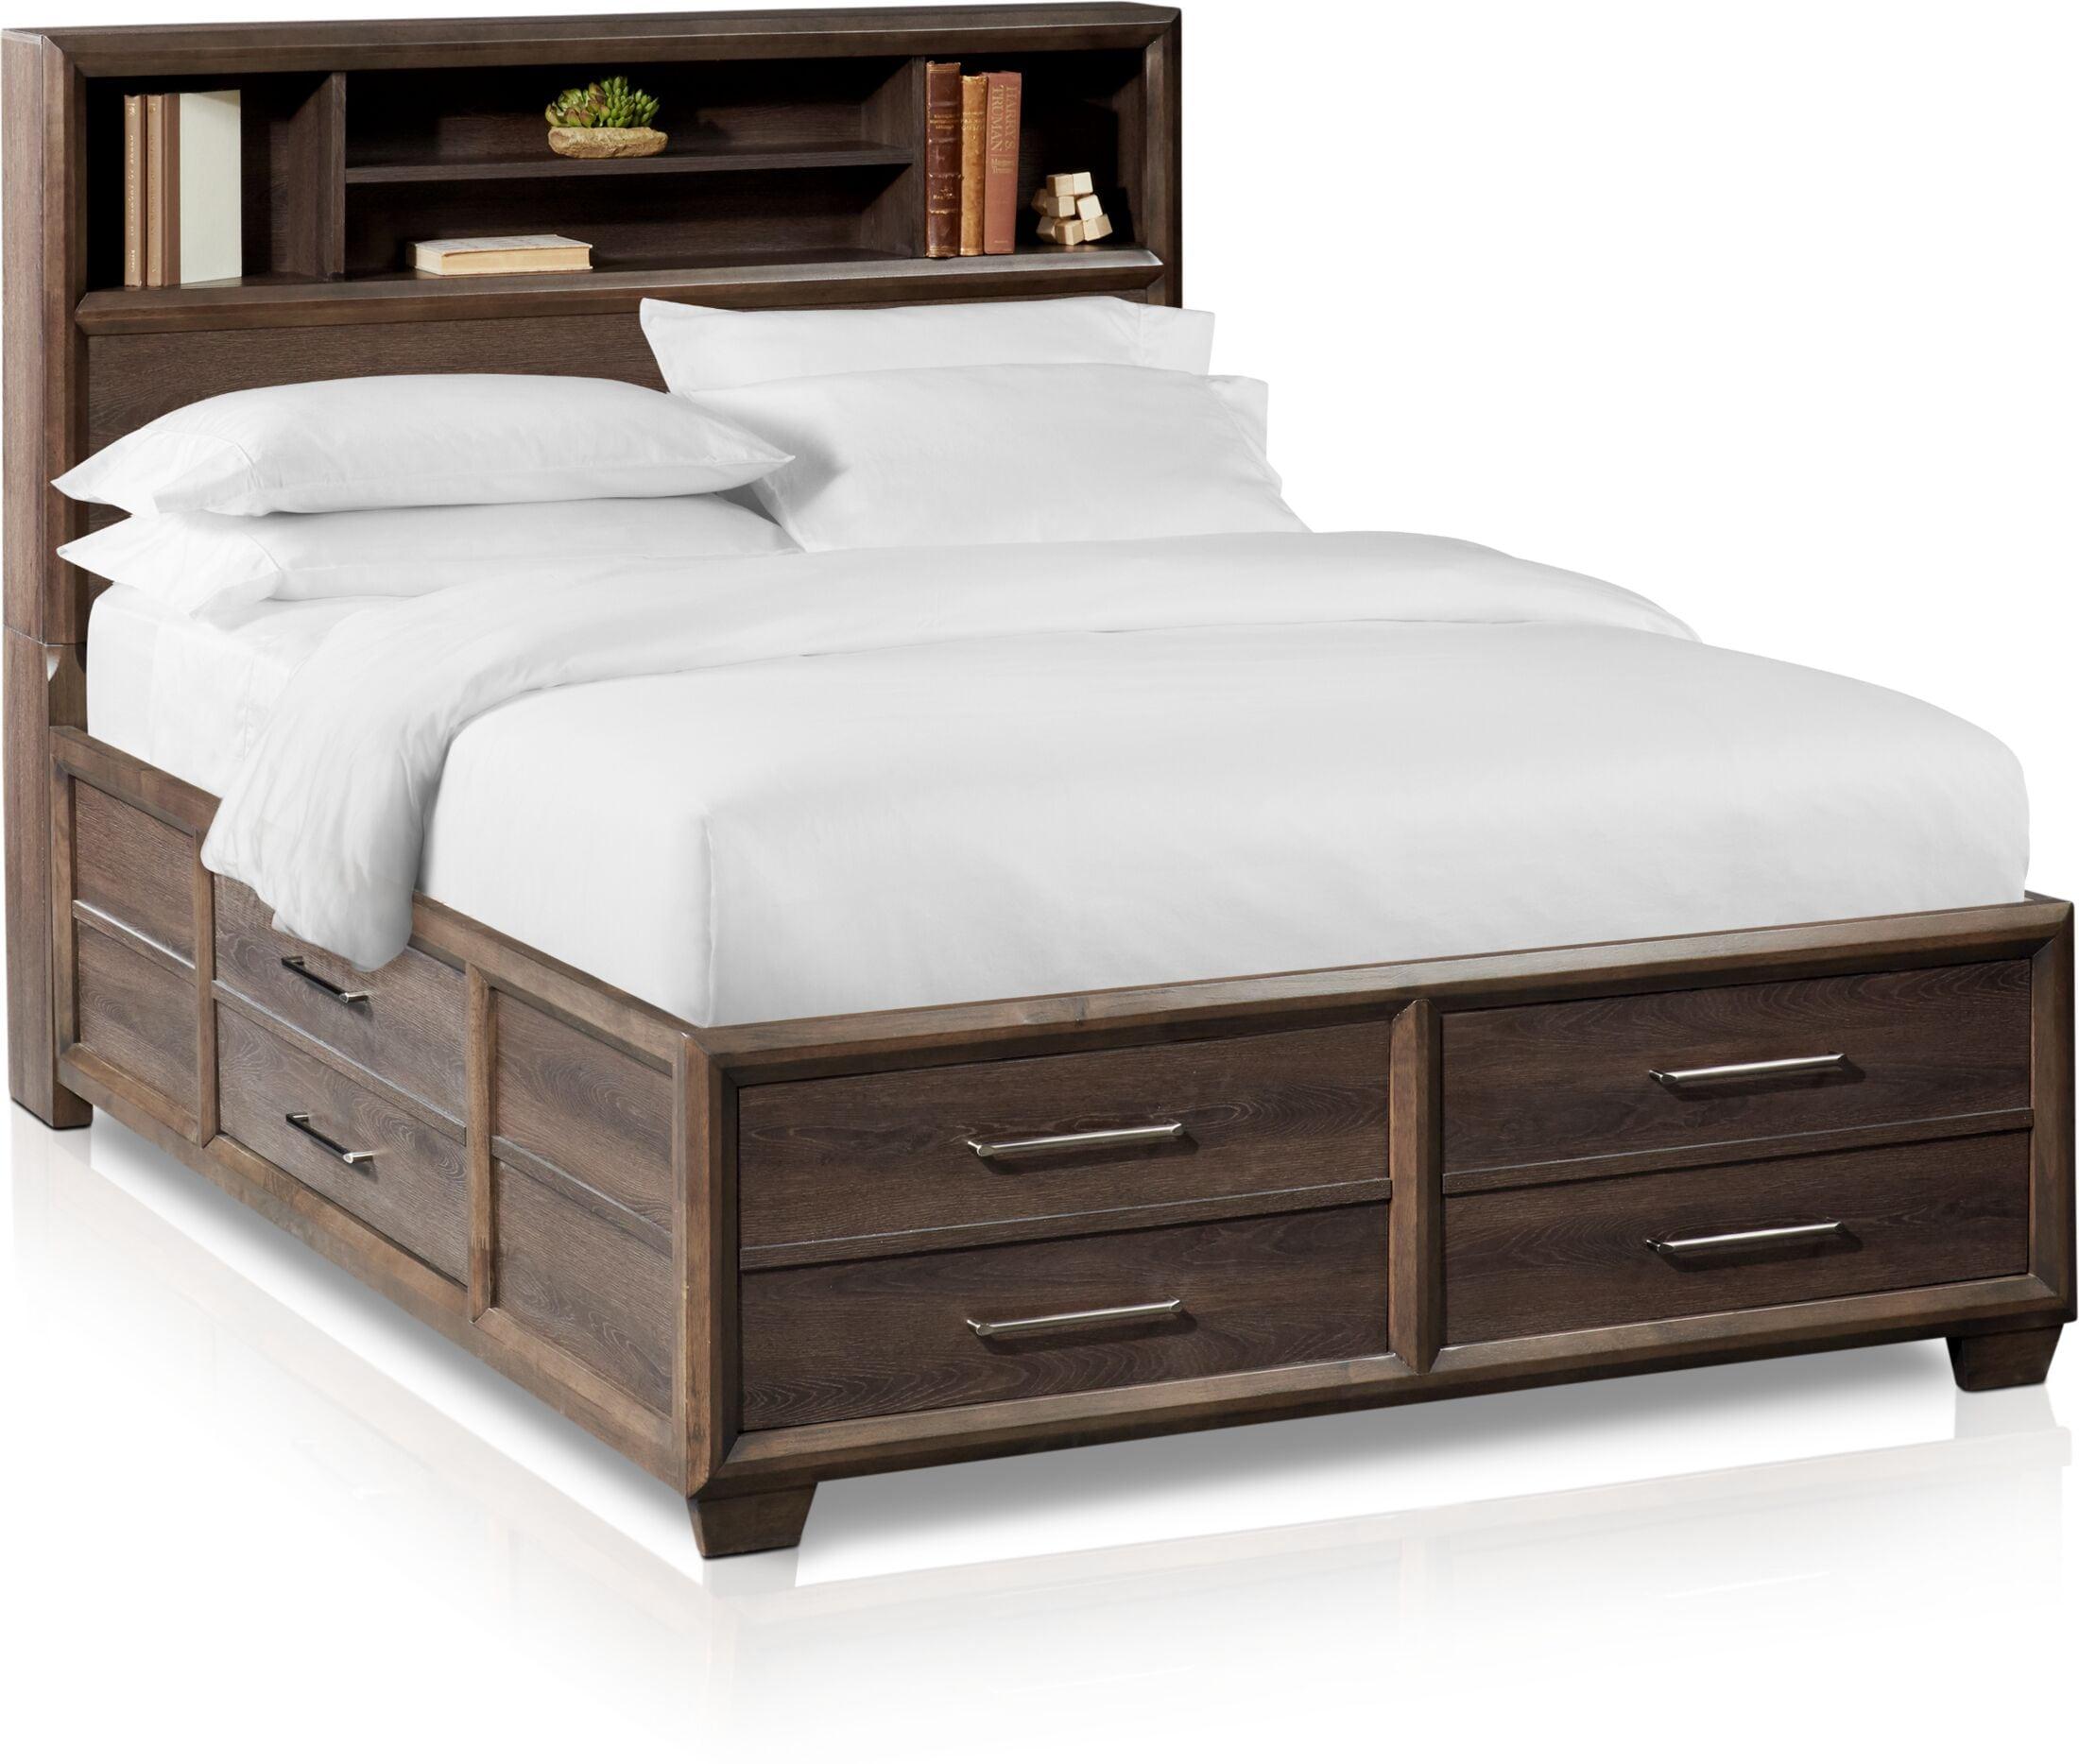 Bedroom Furniture - Dakota Bookcase Storage Bed